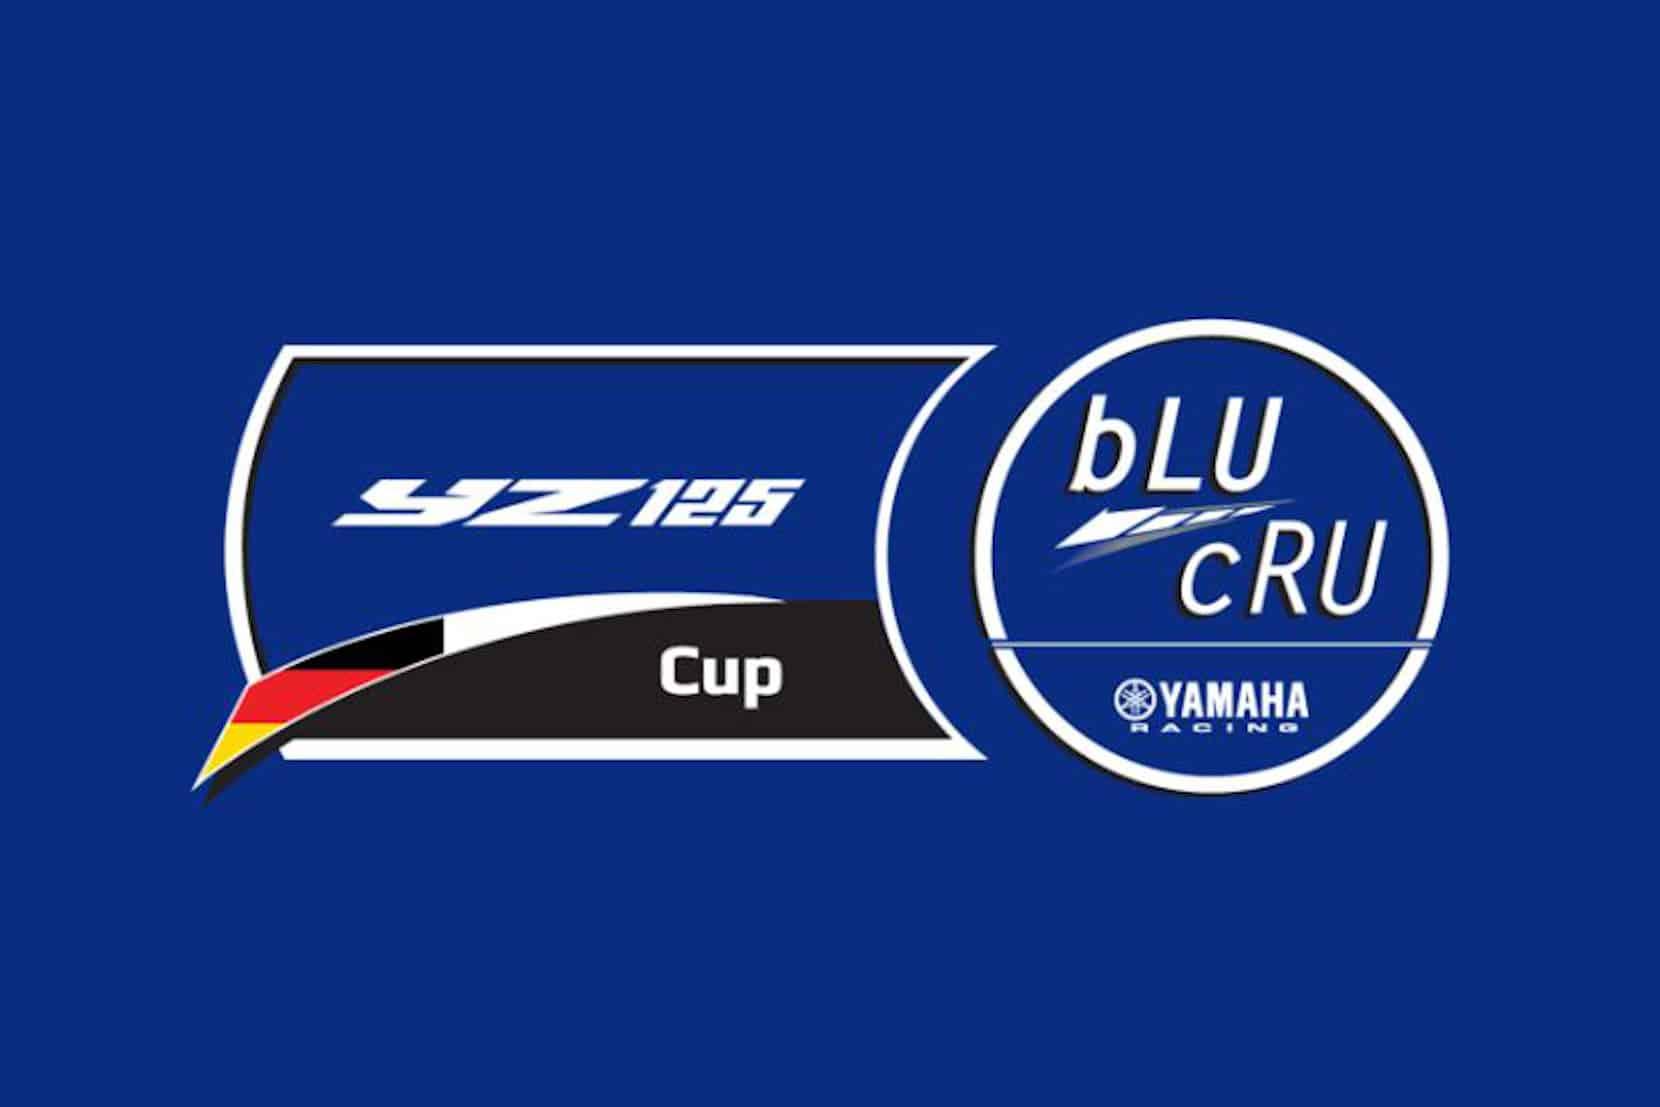 YZ bLU cRU FIM Europe Cup – Ergebnisse Klasse 125ccm Zeittraining